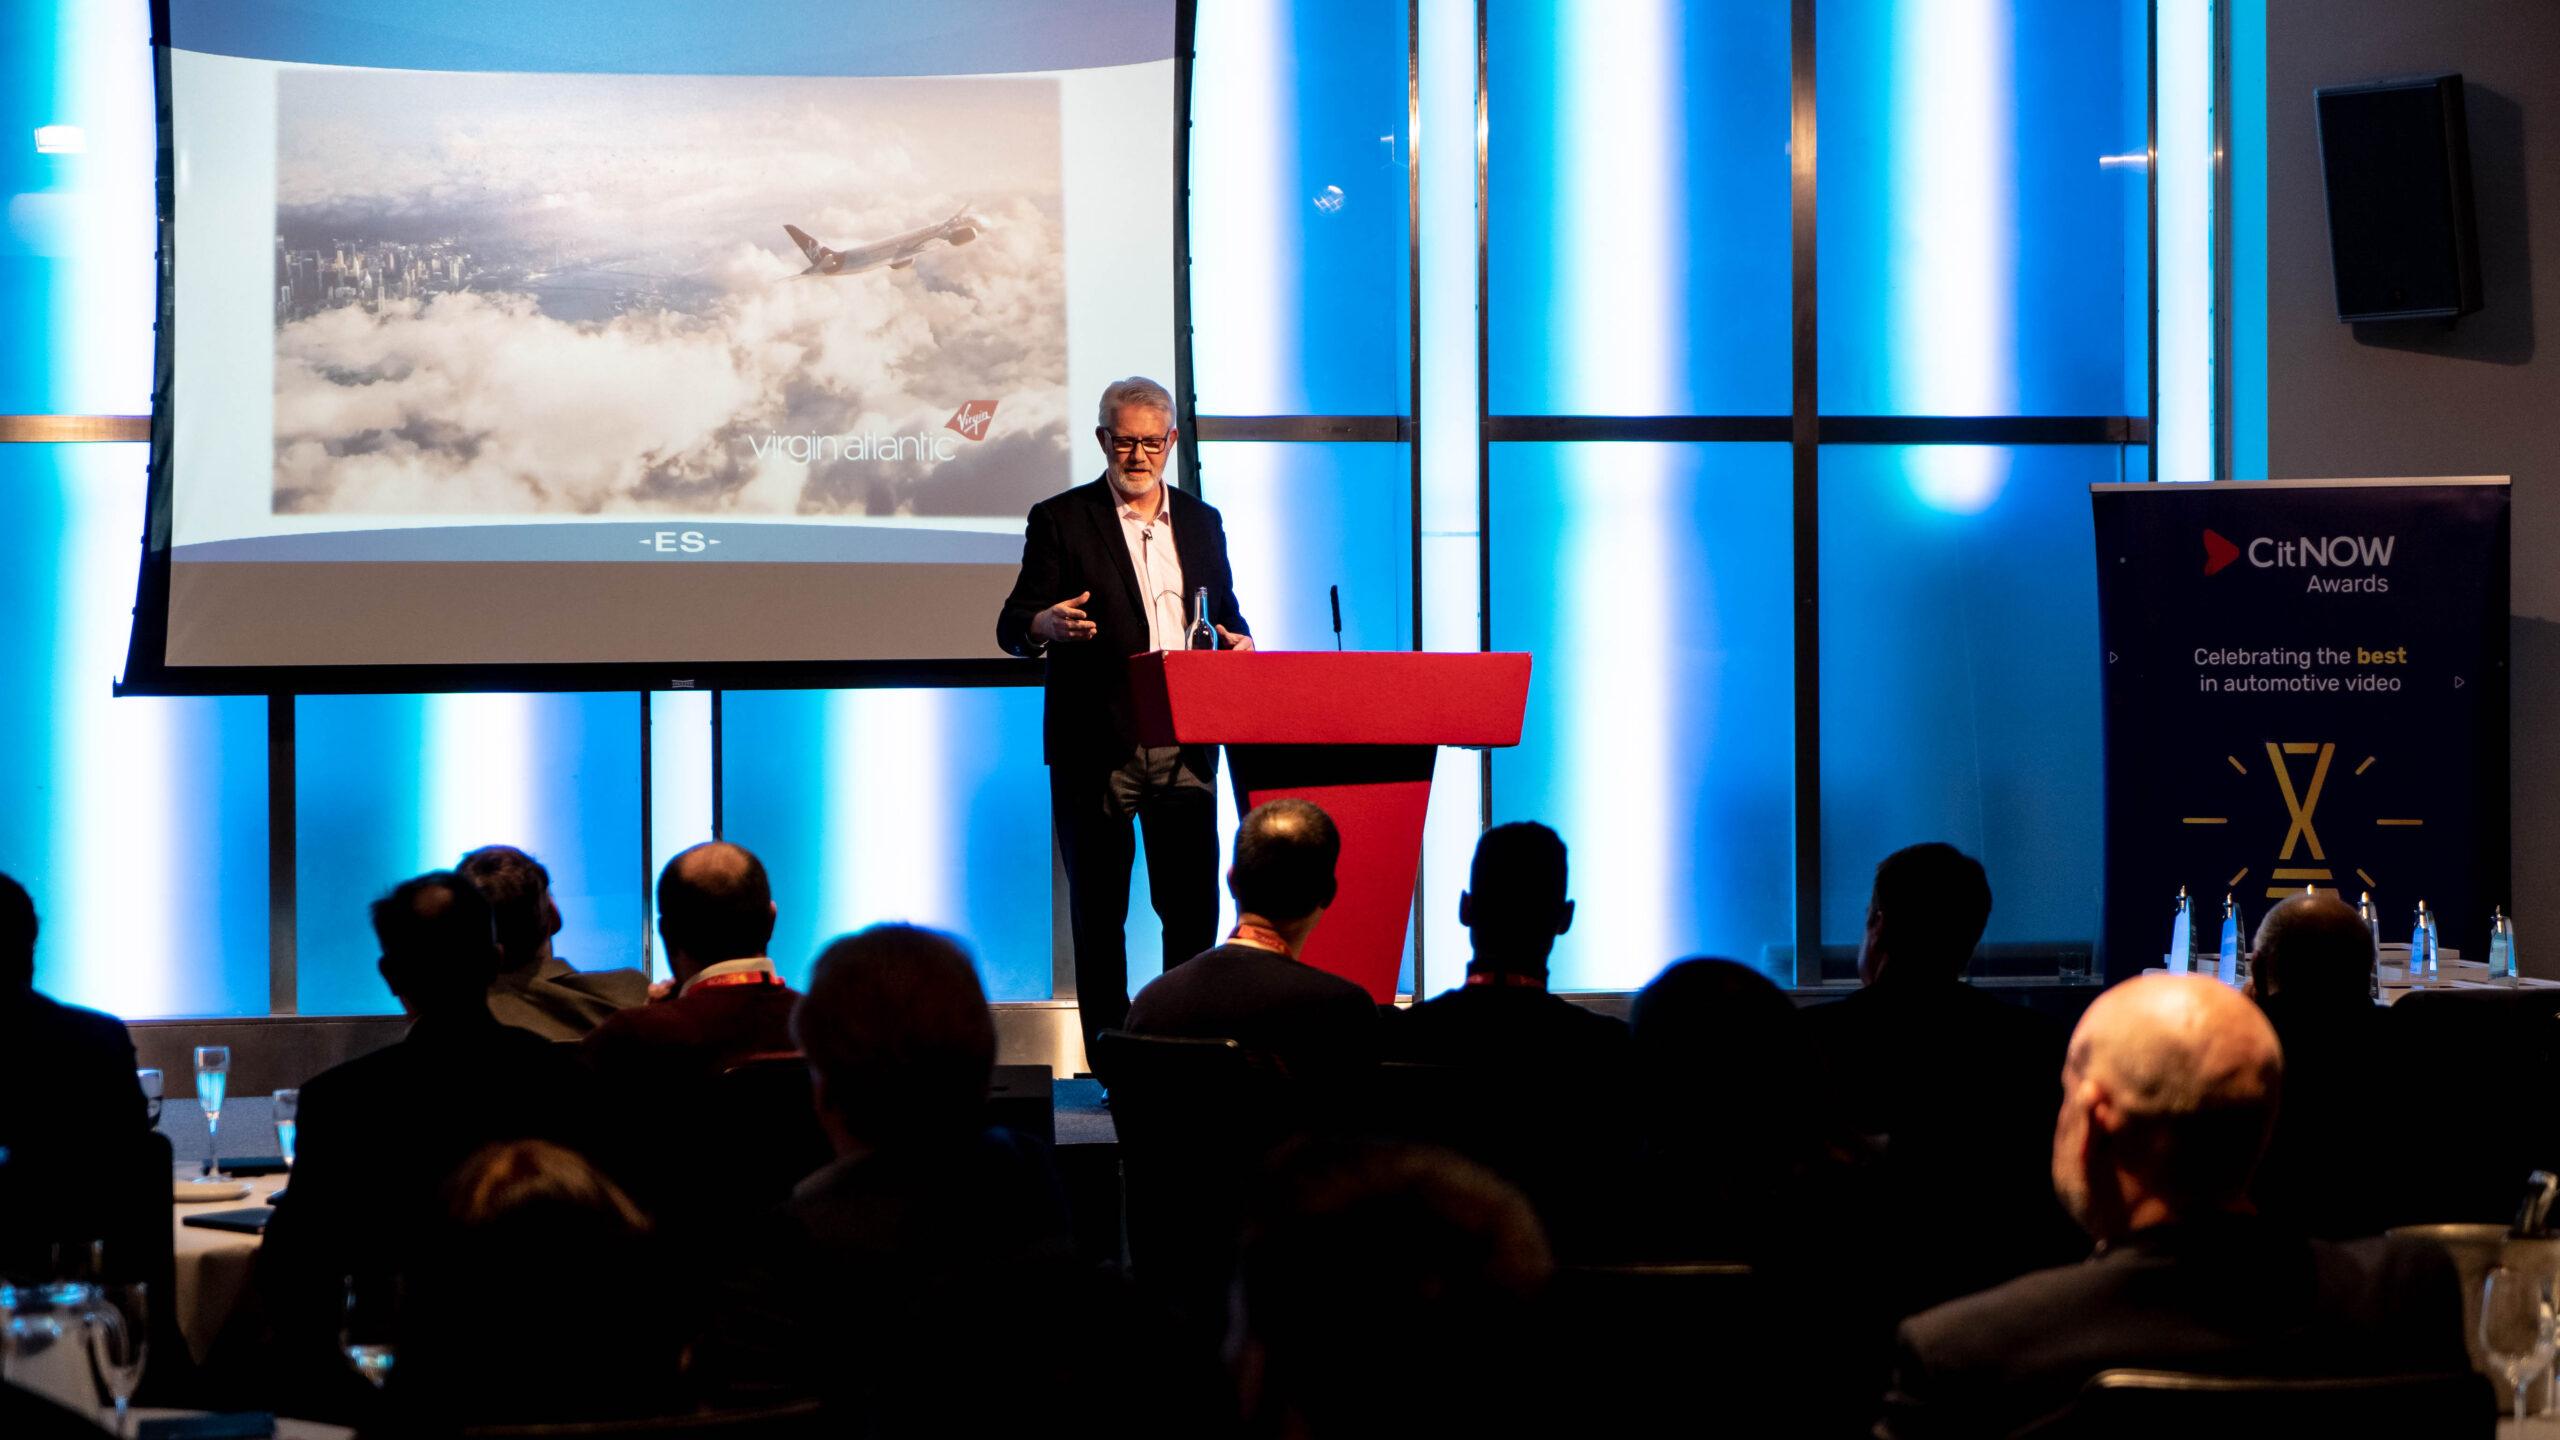 Event speaker on stage